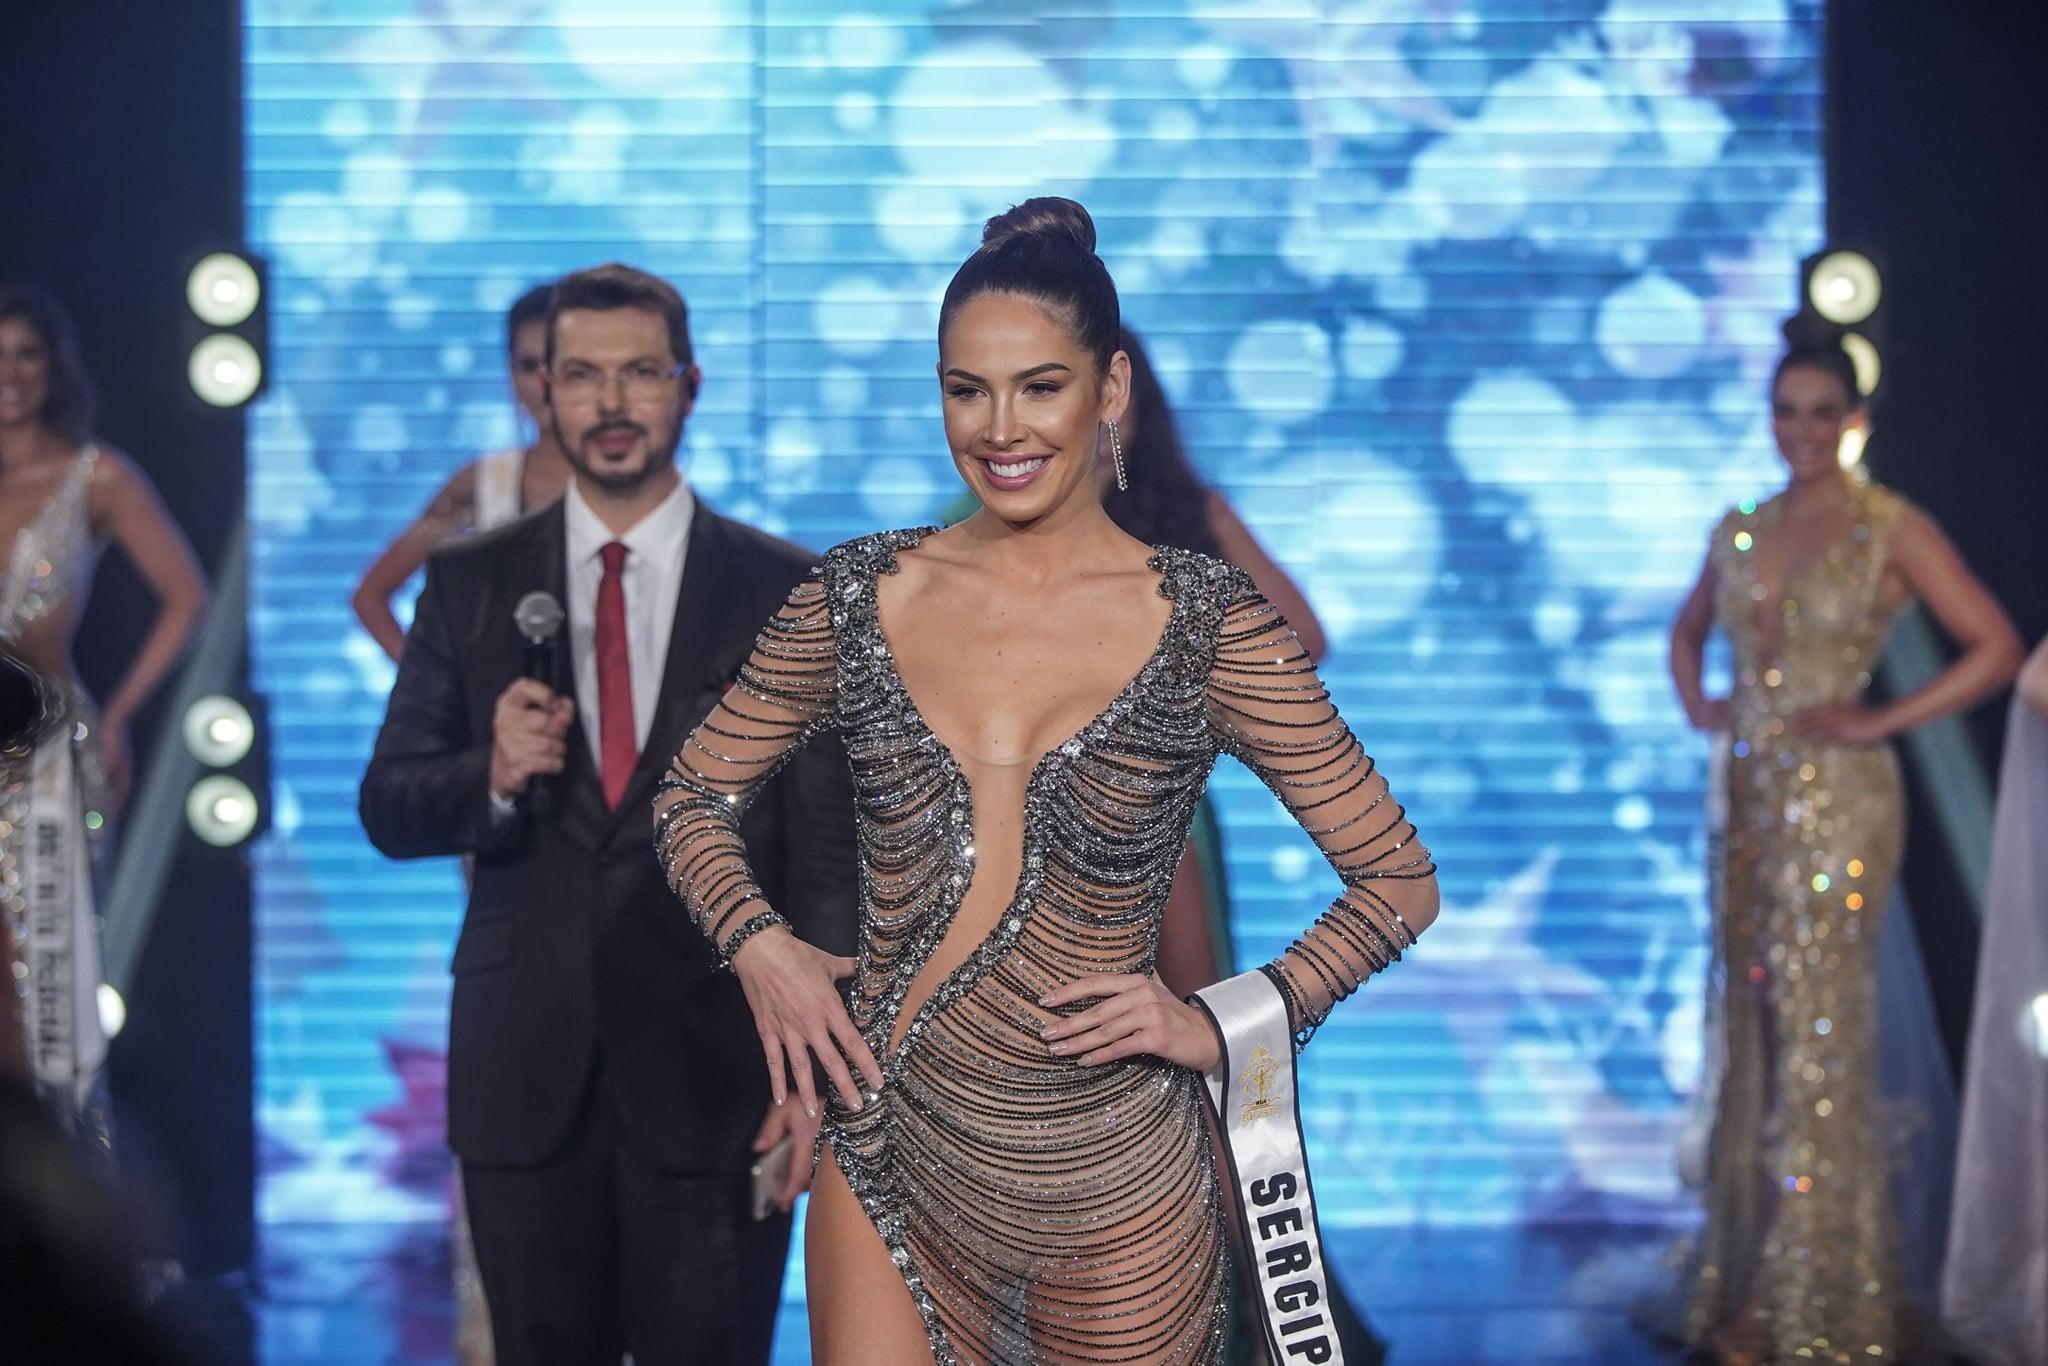 bruna zanardo, 1st runner-up de miss supranational brazil 2020/miss brasil internacional 2017/miss brasil terra 2016. - Página 19 12956110